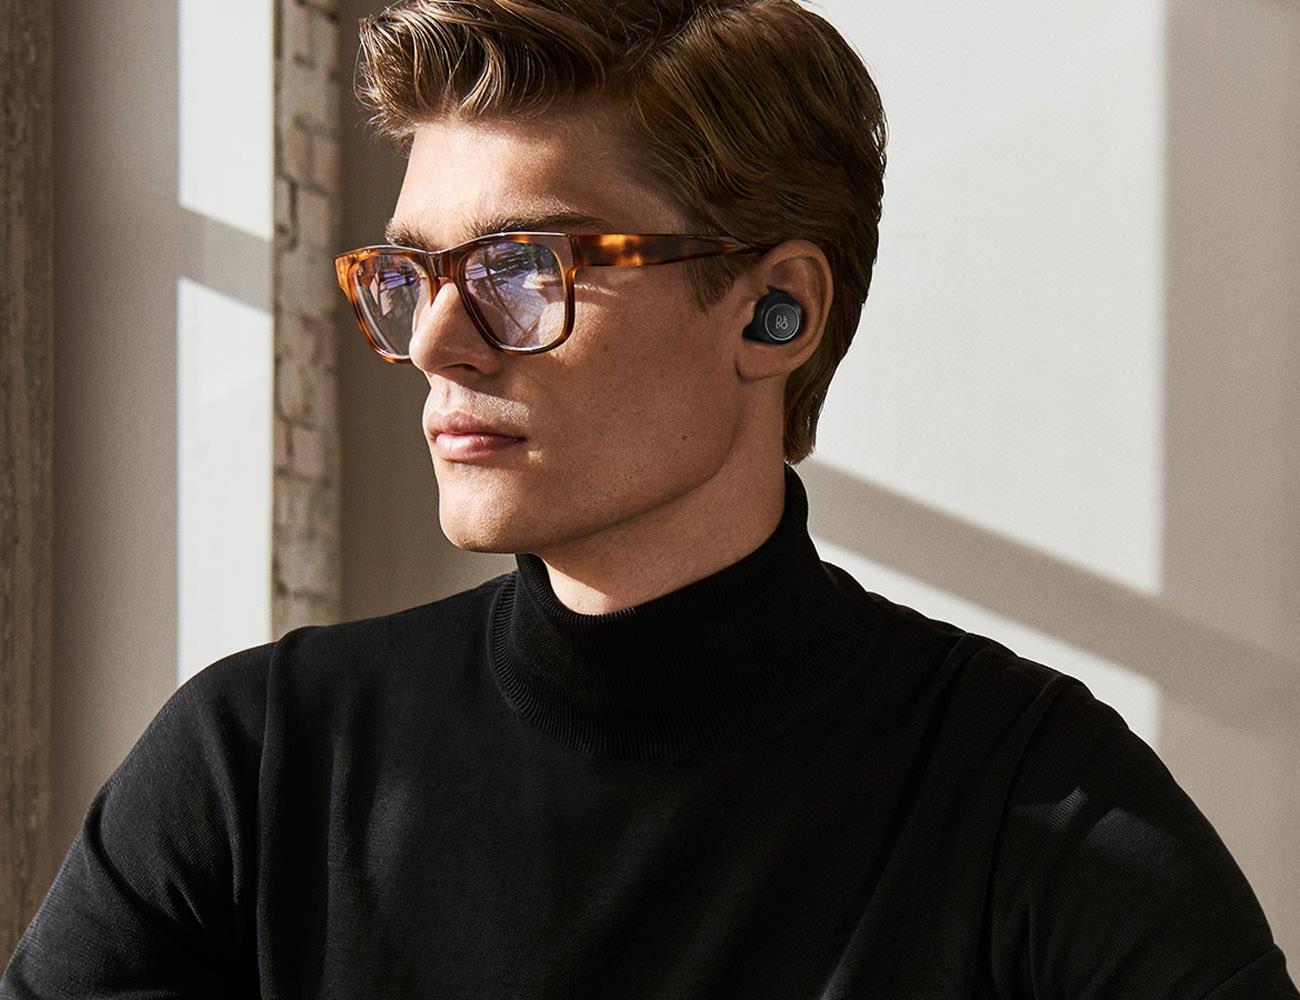 Bang & Olufsen E8 Limited Edition True Wireless Headphones